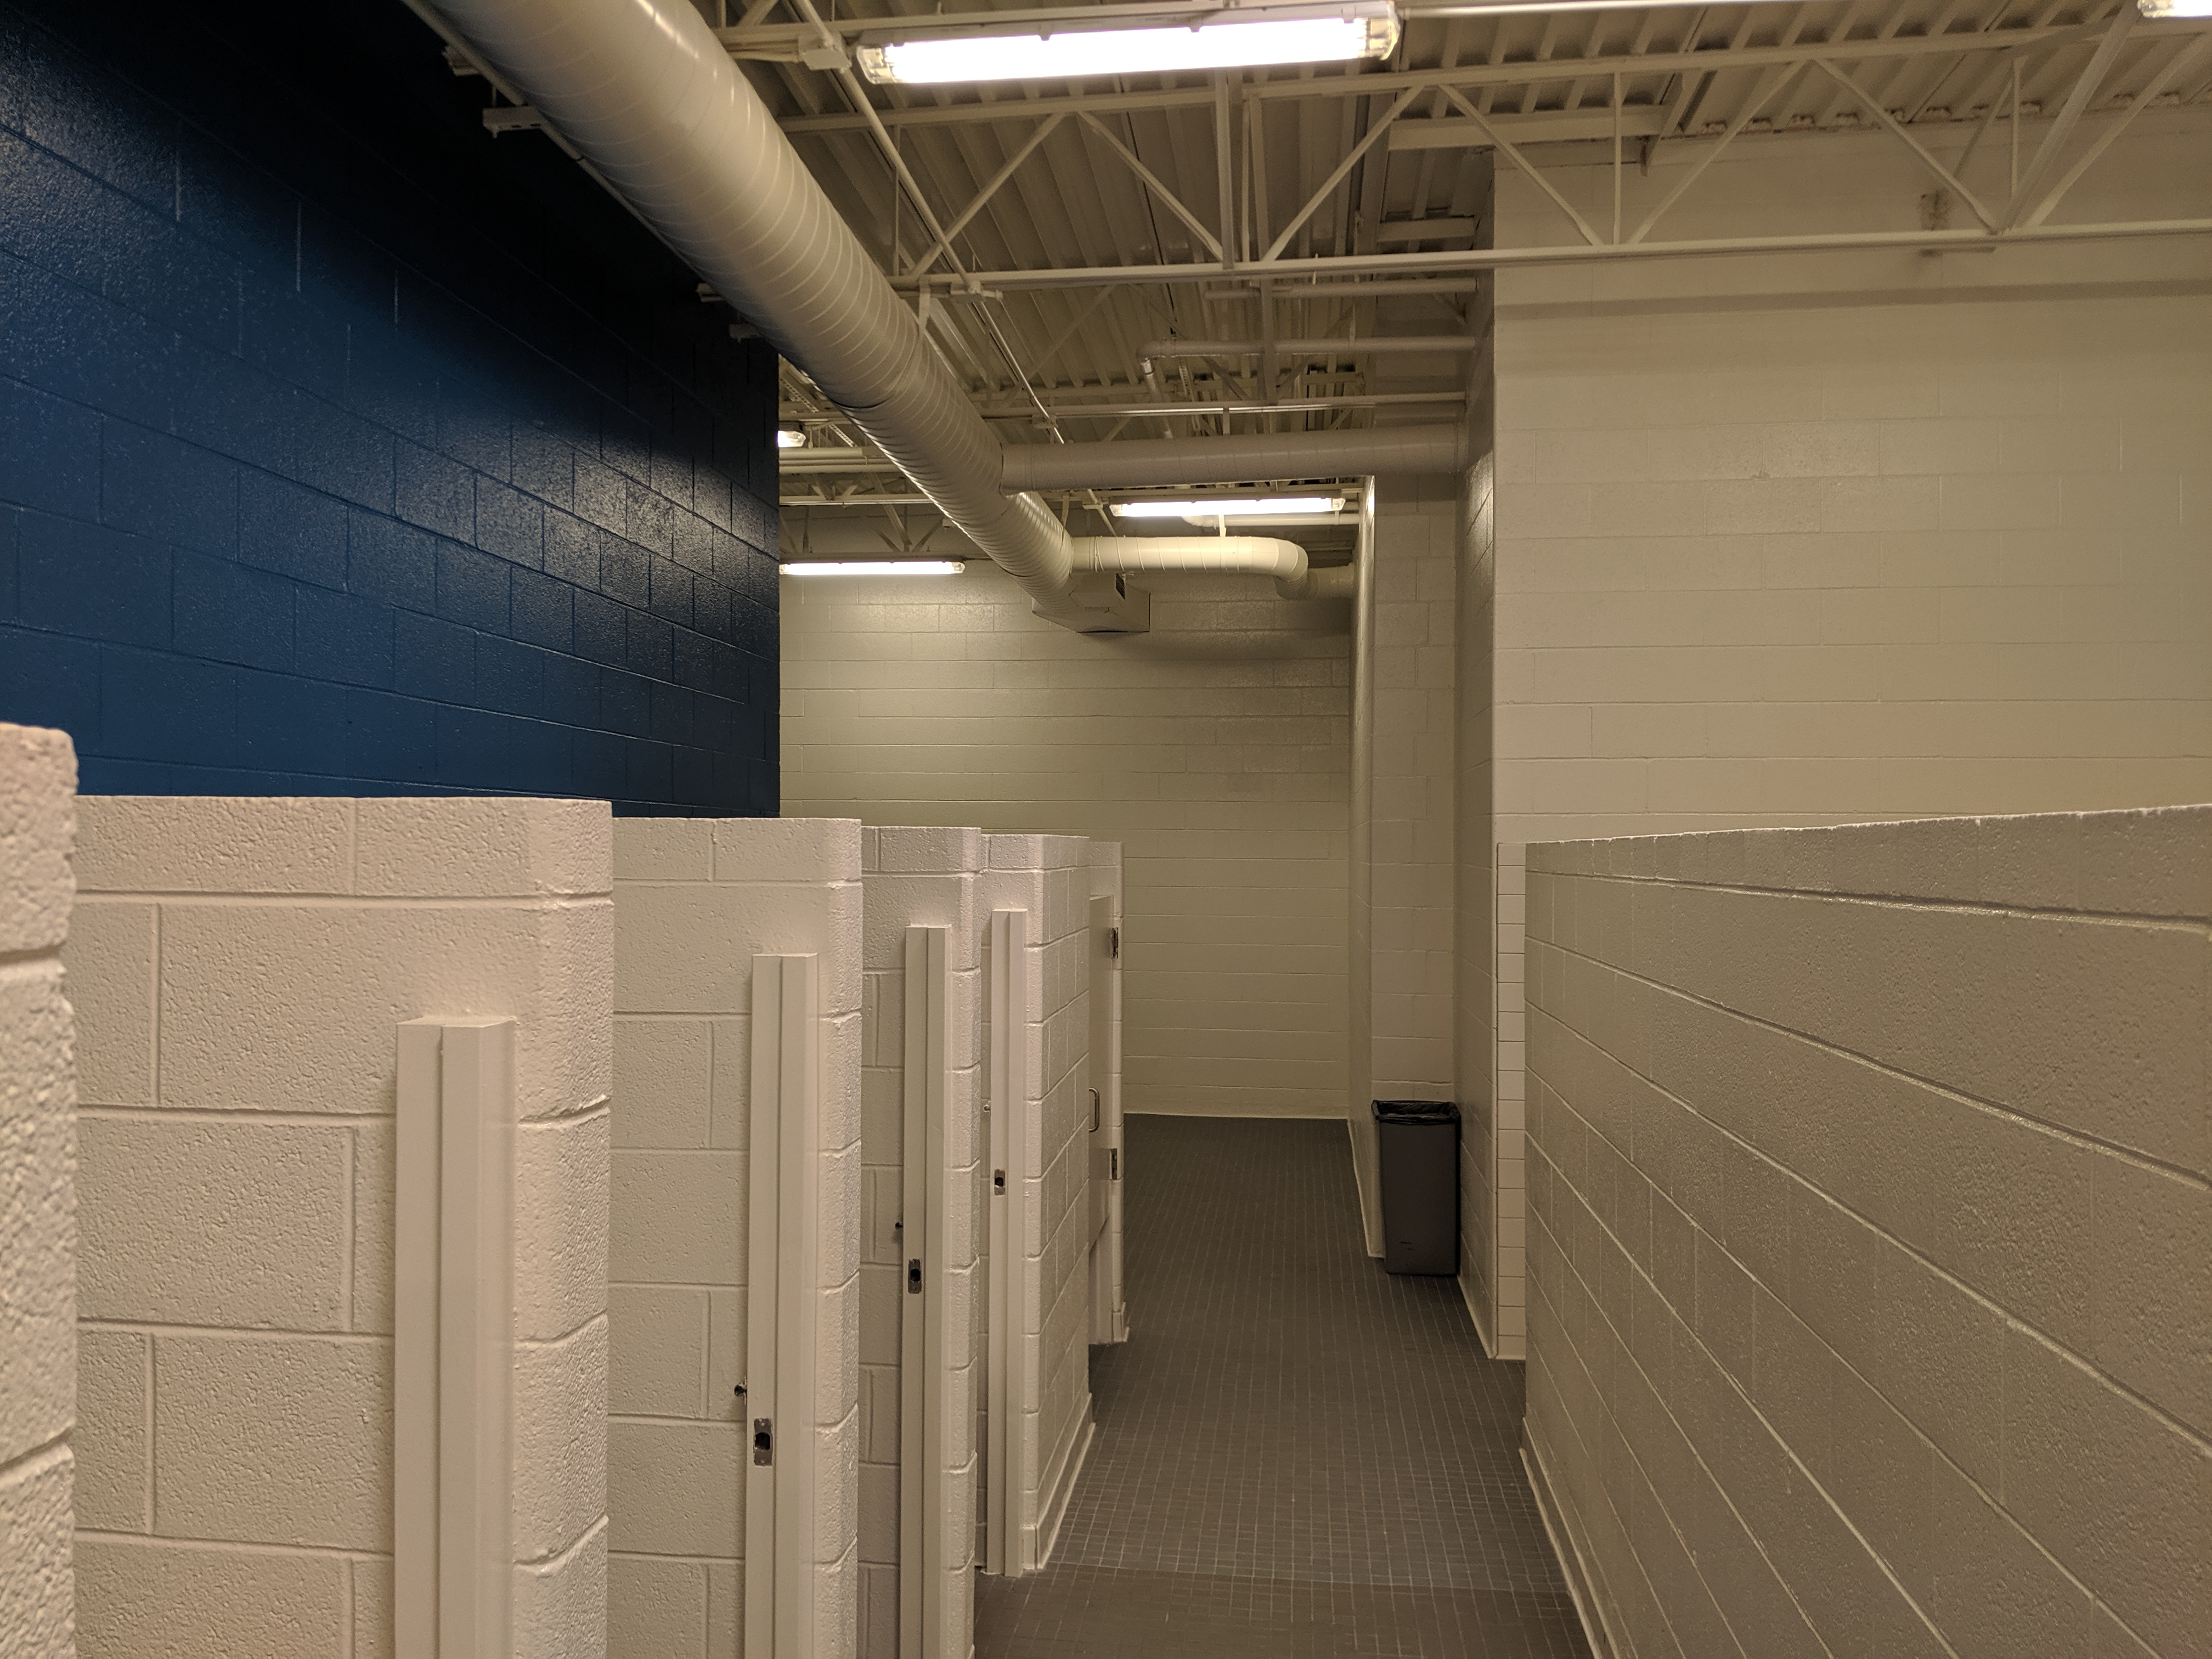 New Restroom